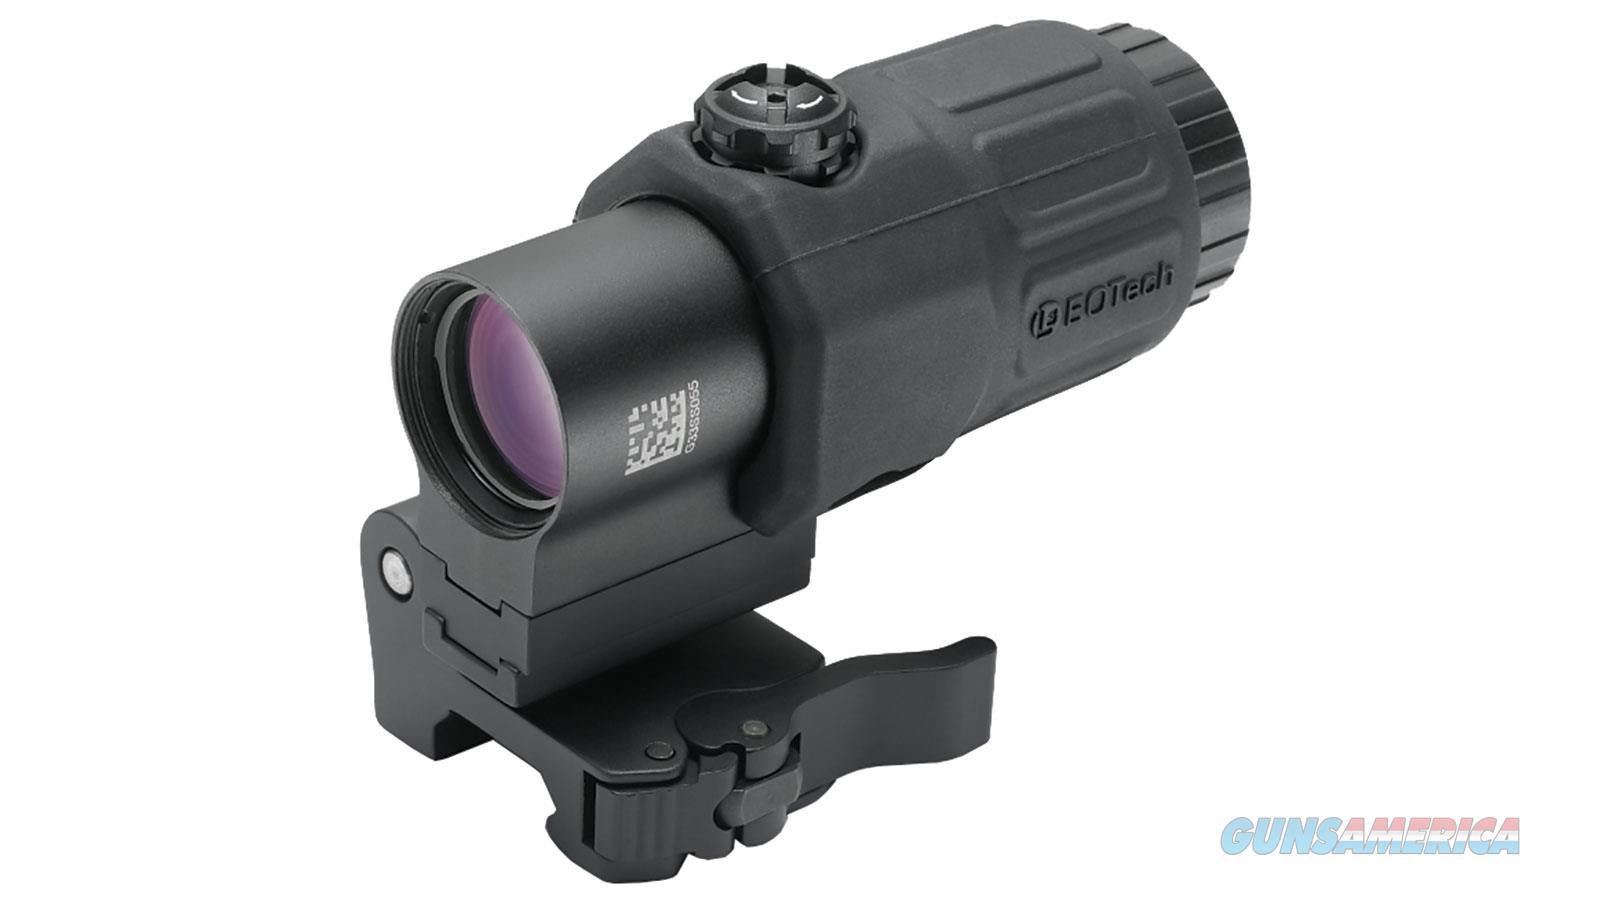 Geniii 3X Magnifier W/Mnt G33.STS  Non-Guns > Iron/Metal/Peep Sights